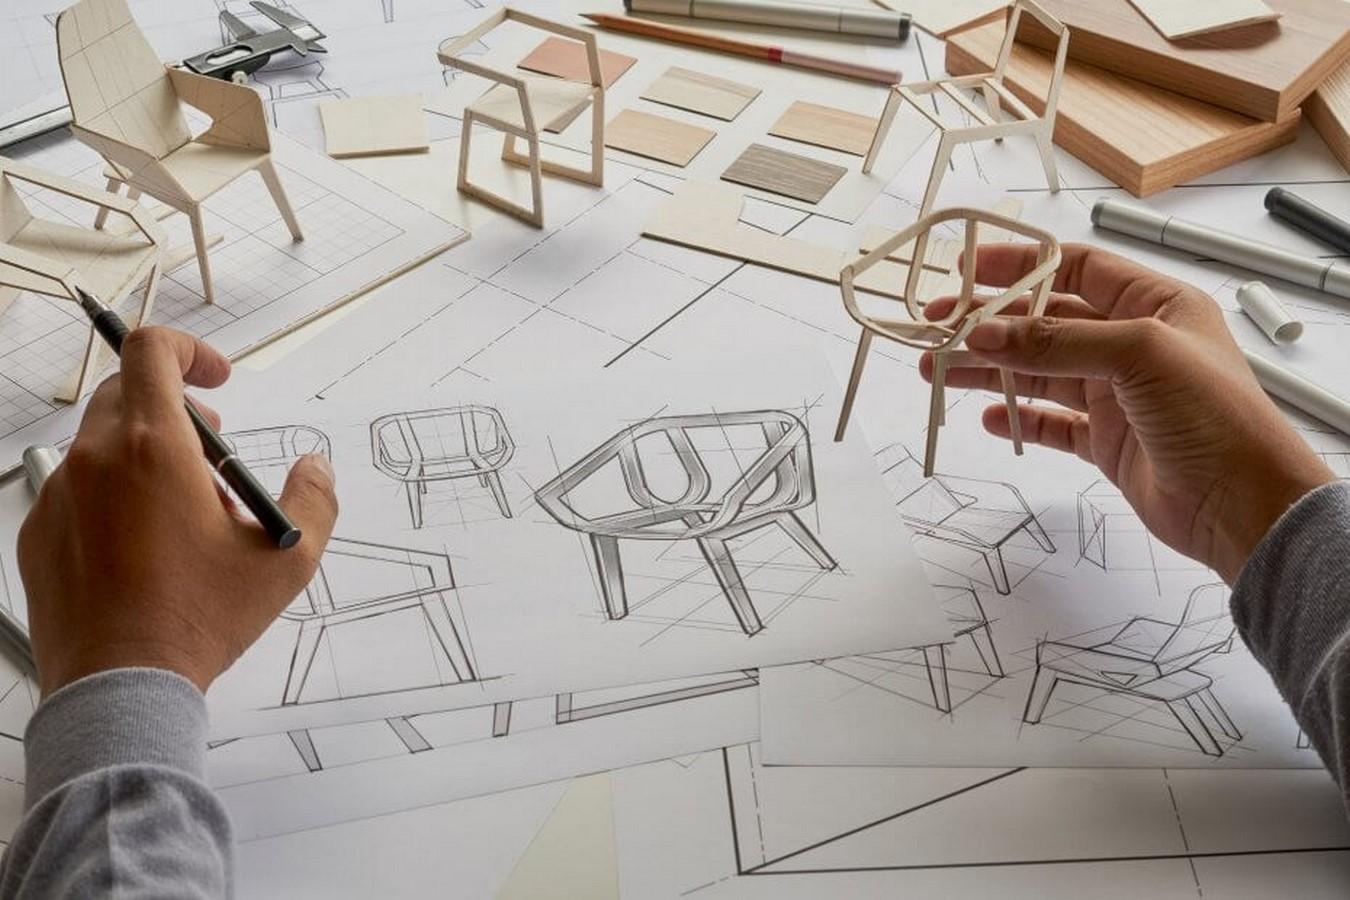 Past, Present and Future: Furniture Design - Sheet1